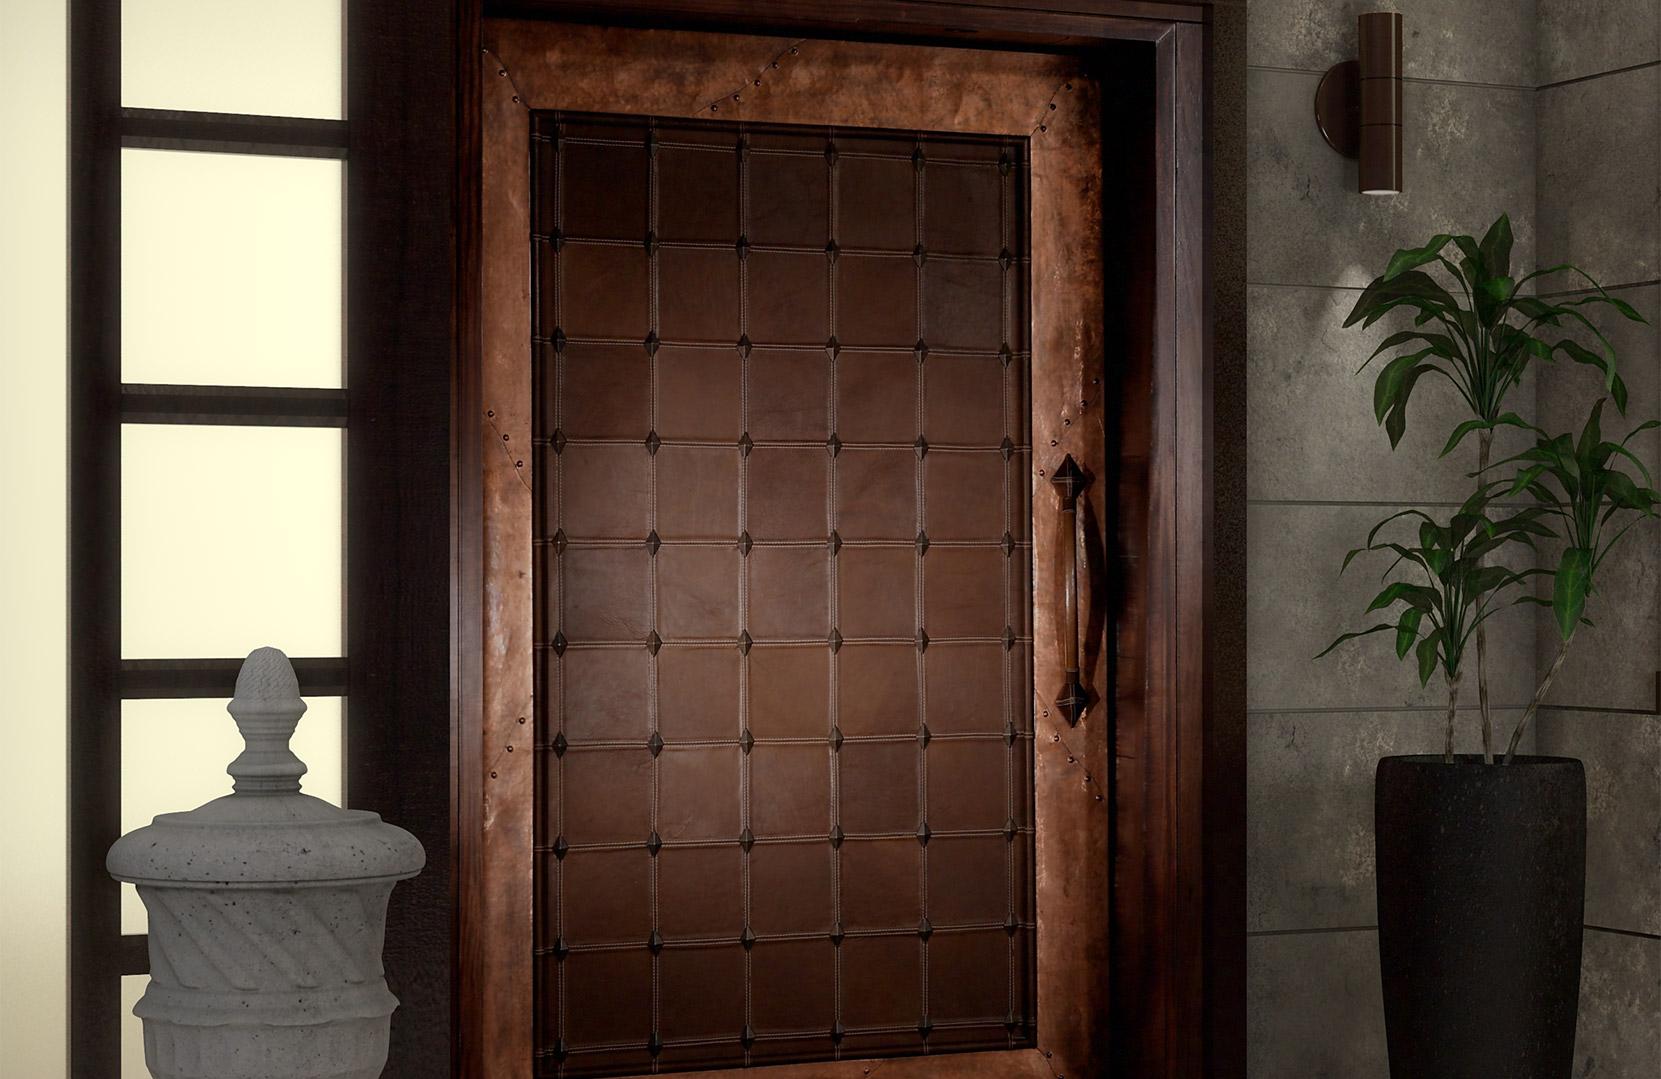 6 Unique and Artistic Exterior Front Door Designs for 2021